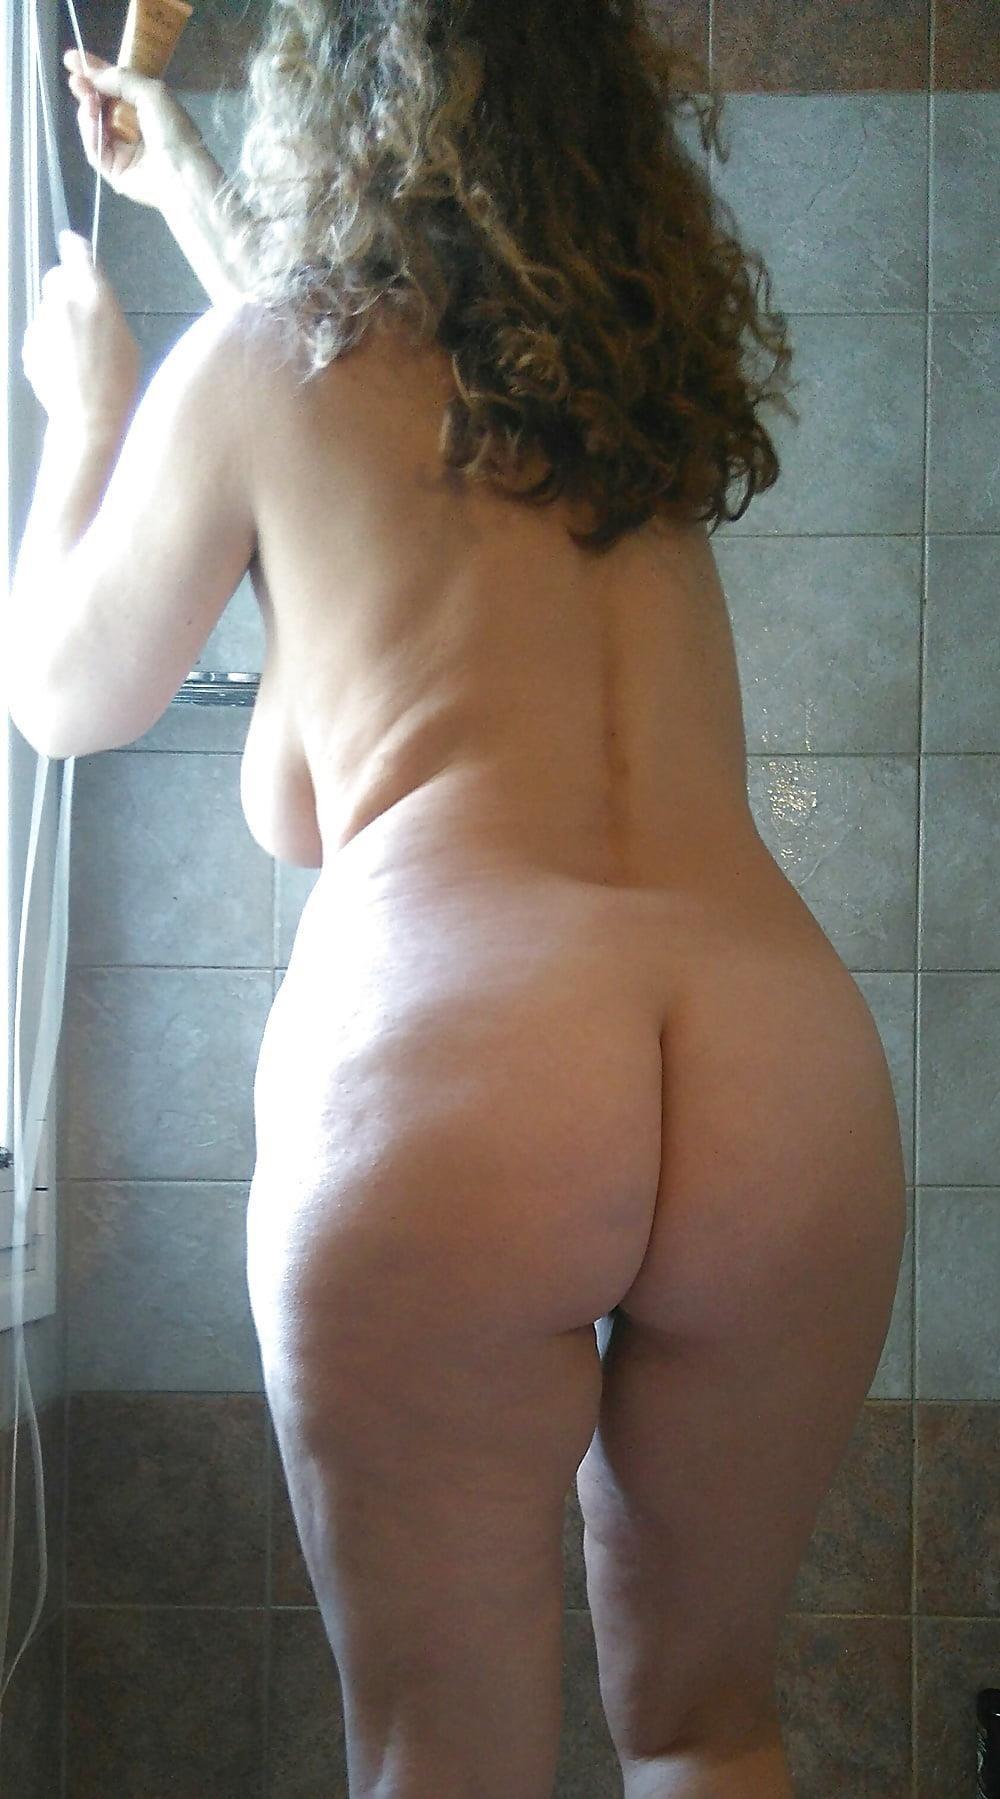 Big sexy juicy boobs-999